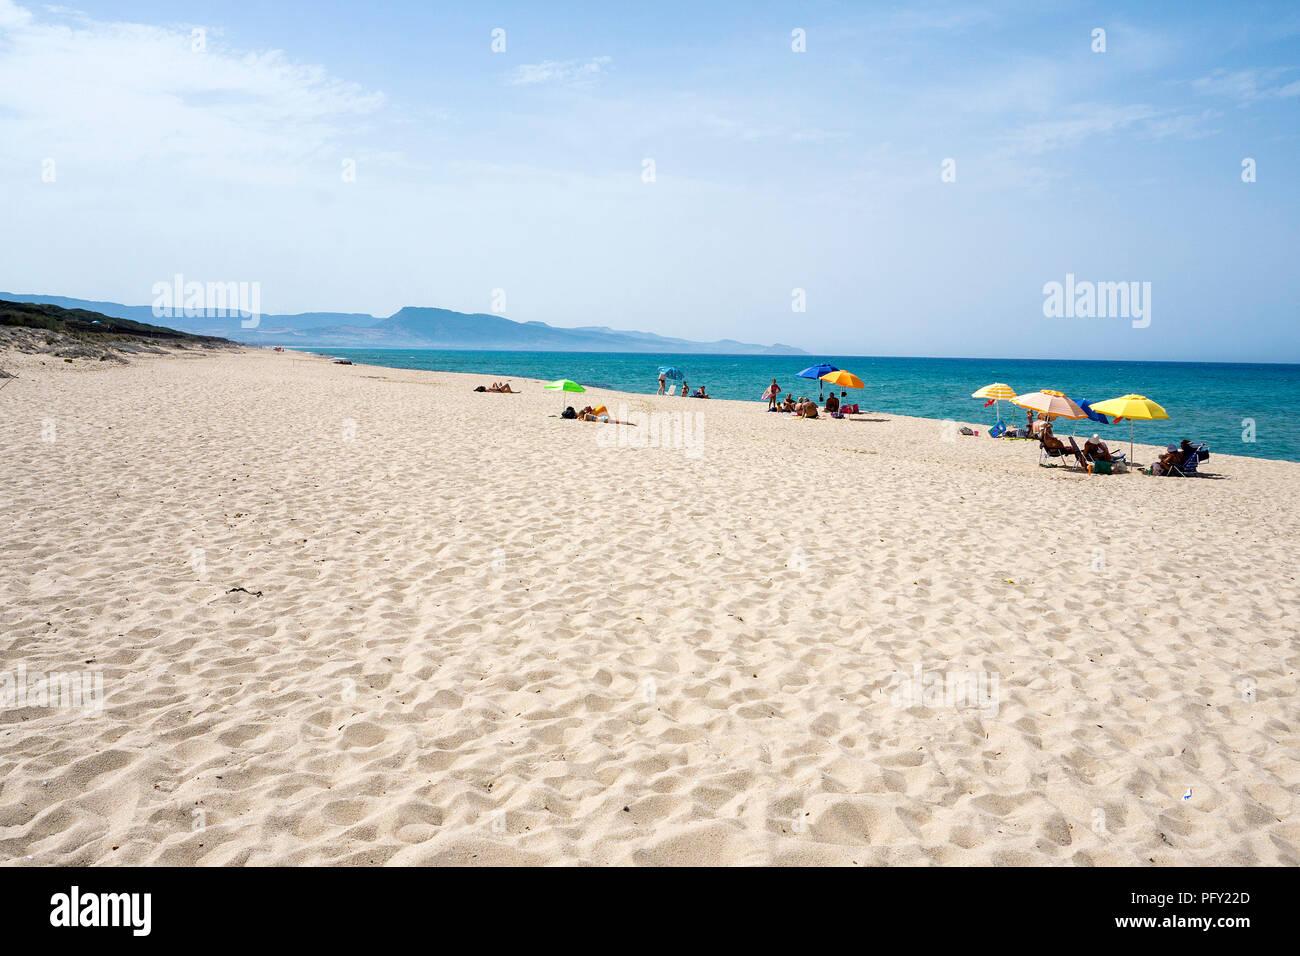 White sand beach with colorful umbrellas and bathers, Badesi, Sassari province, Sardinia, Italy - Stock Image